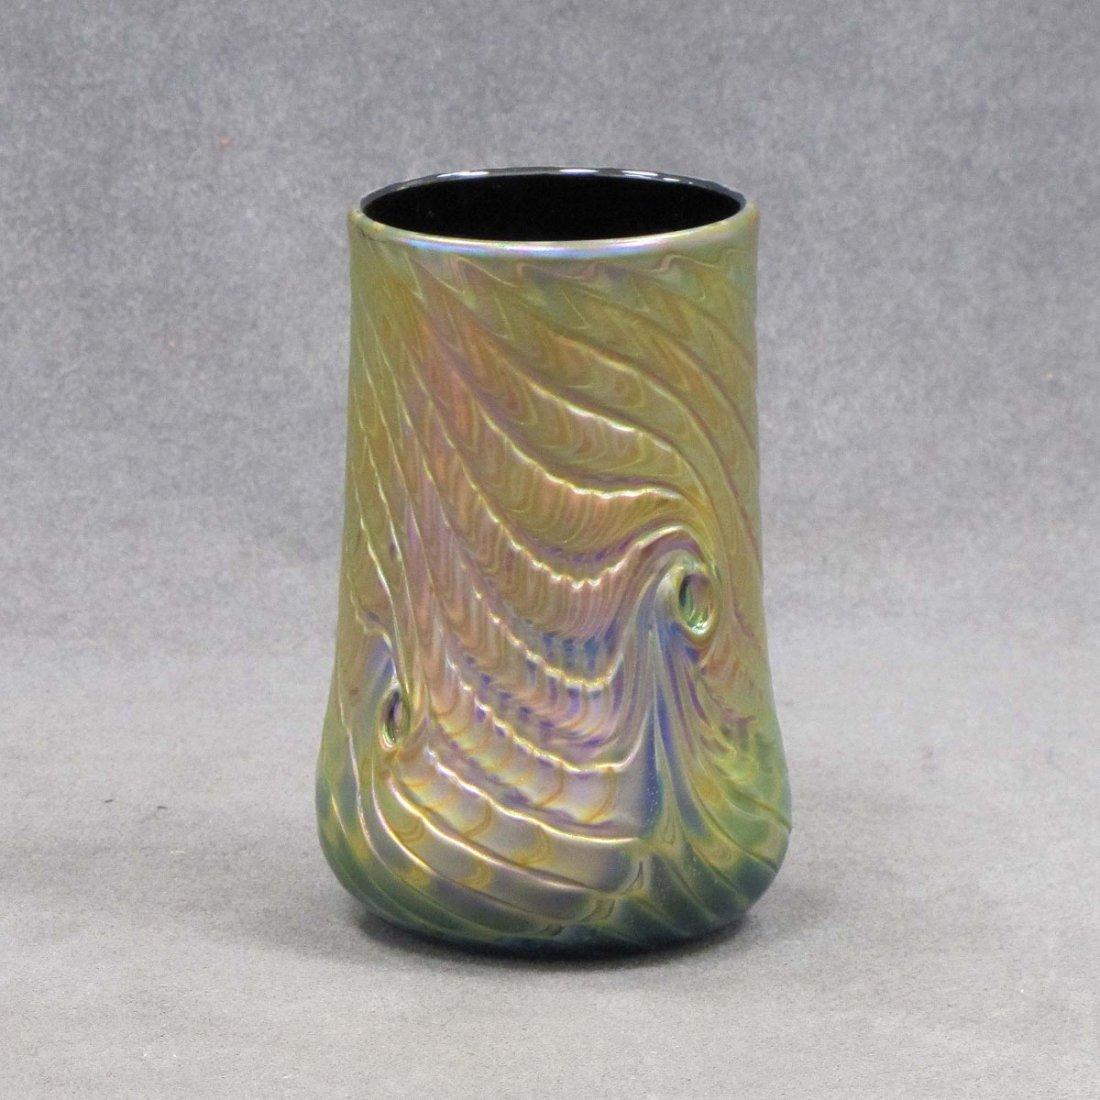 6: IRIDESCENT ART GLASS PEACOCK FEATHER VASE